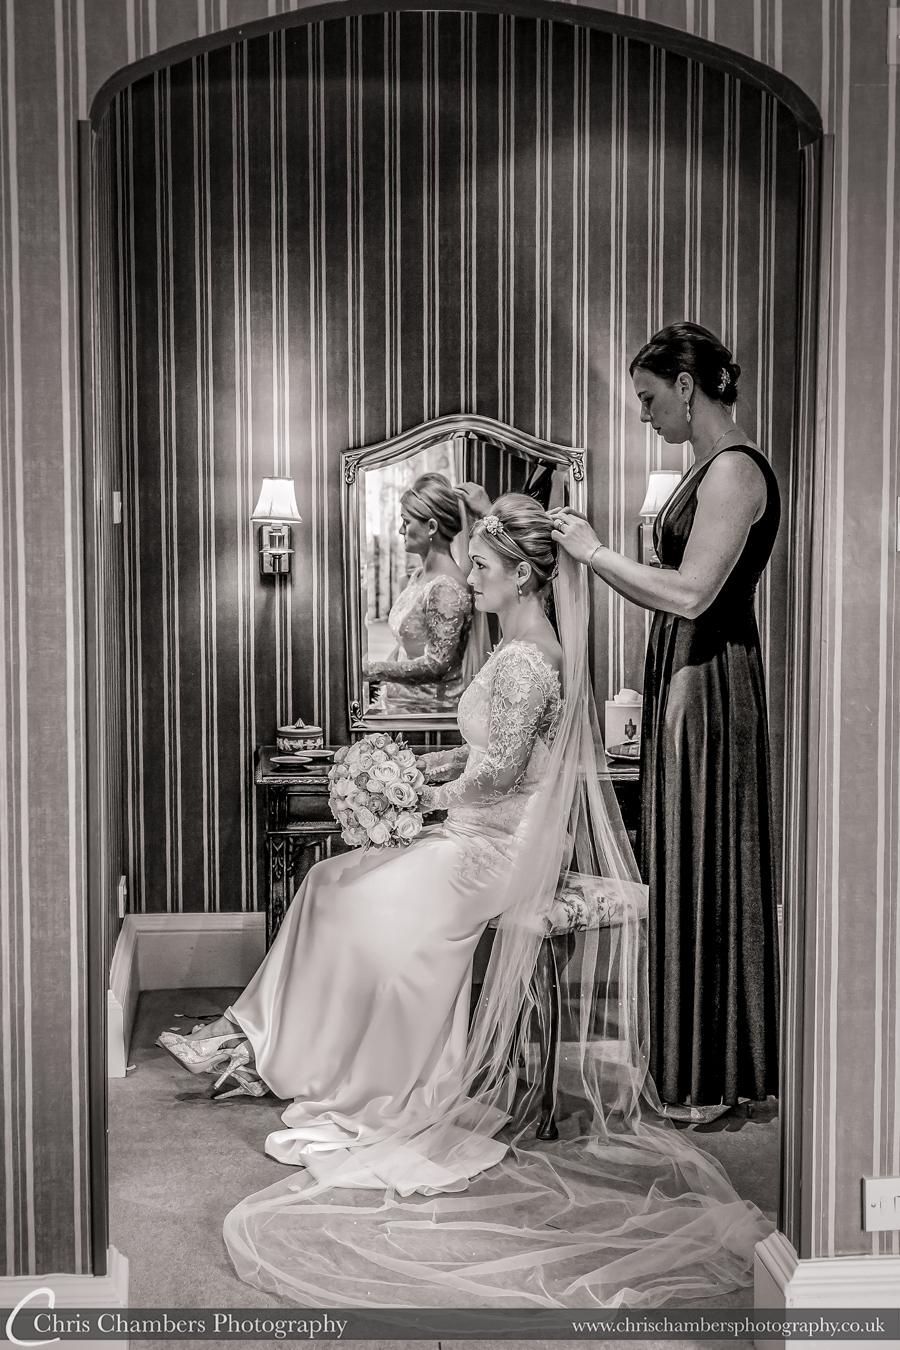 Swinton park wedding photos. Photography from award winning photographer Chris Chambers